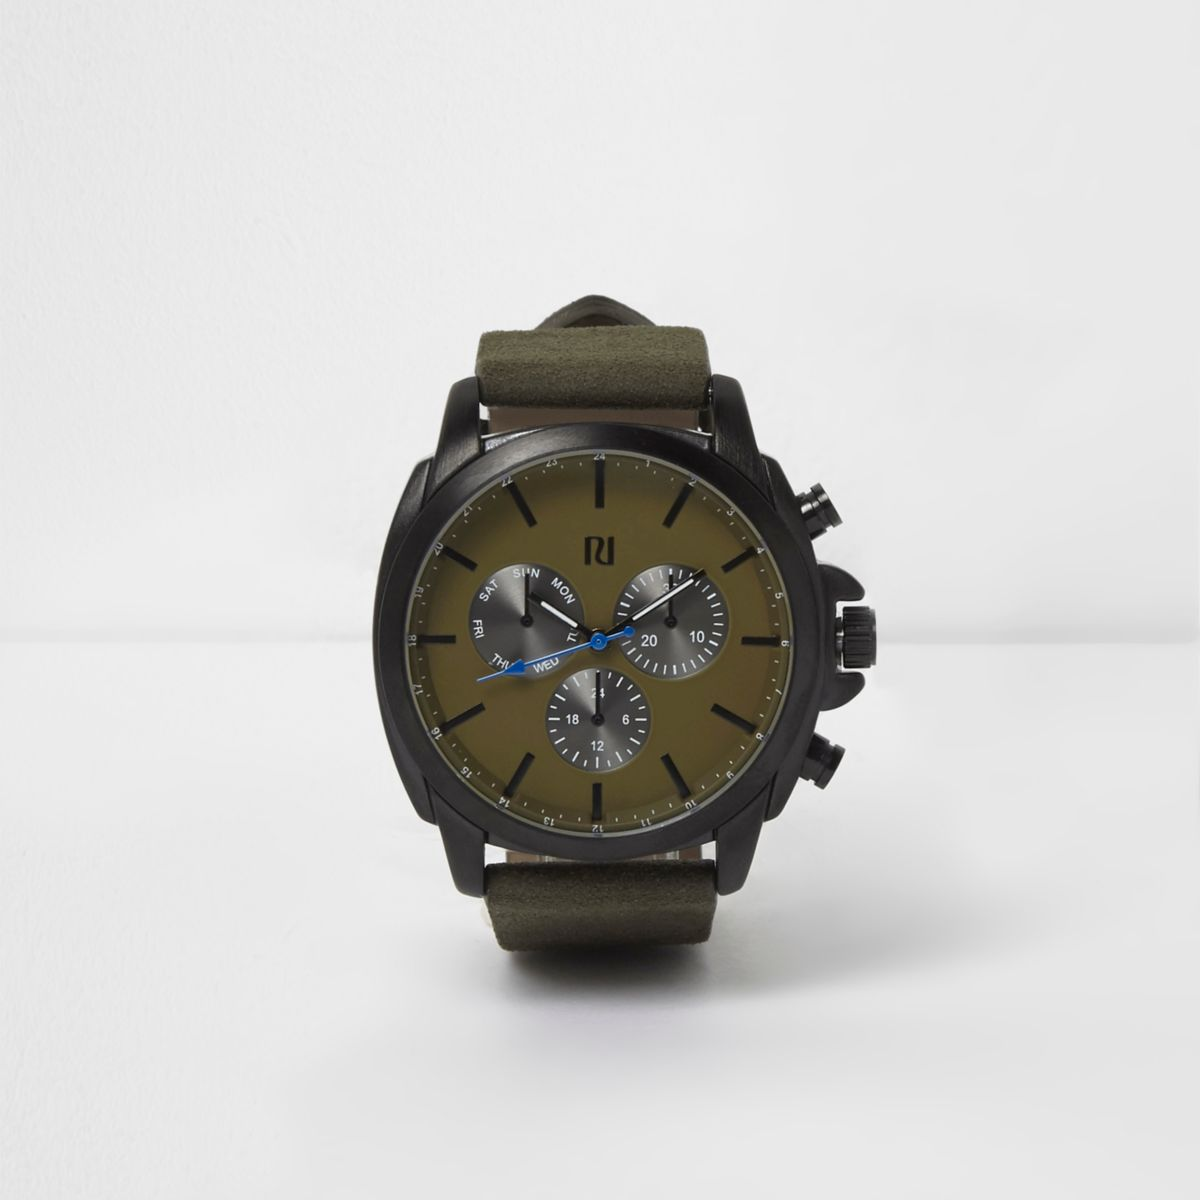 Green gunmetal case watch